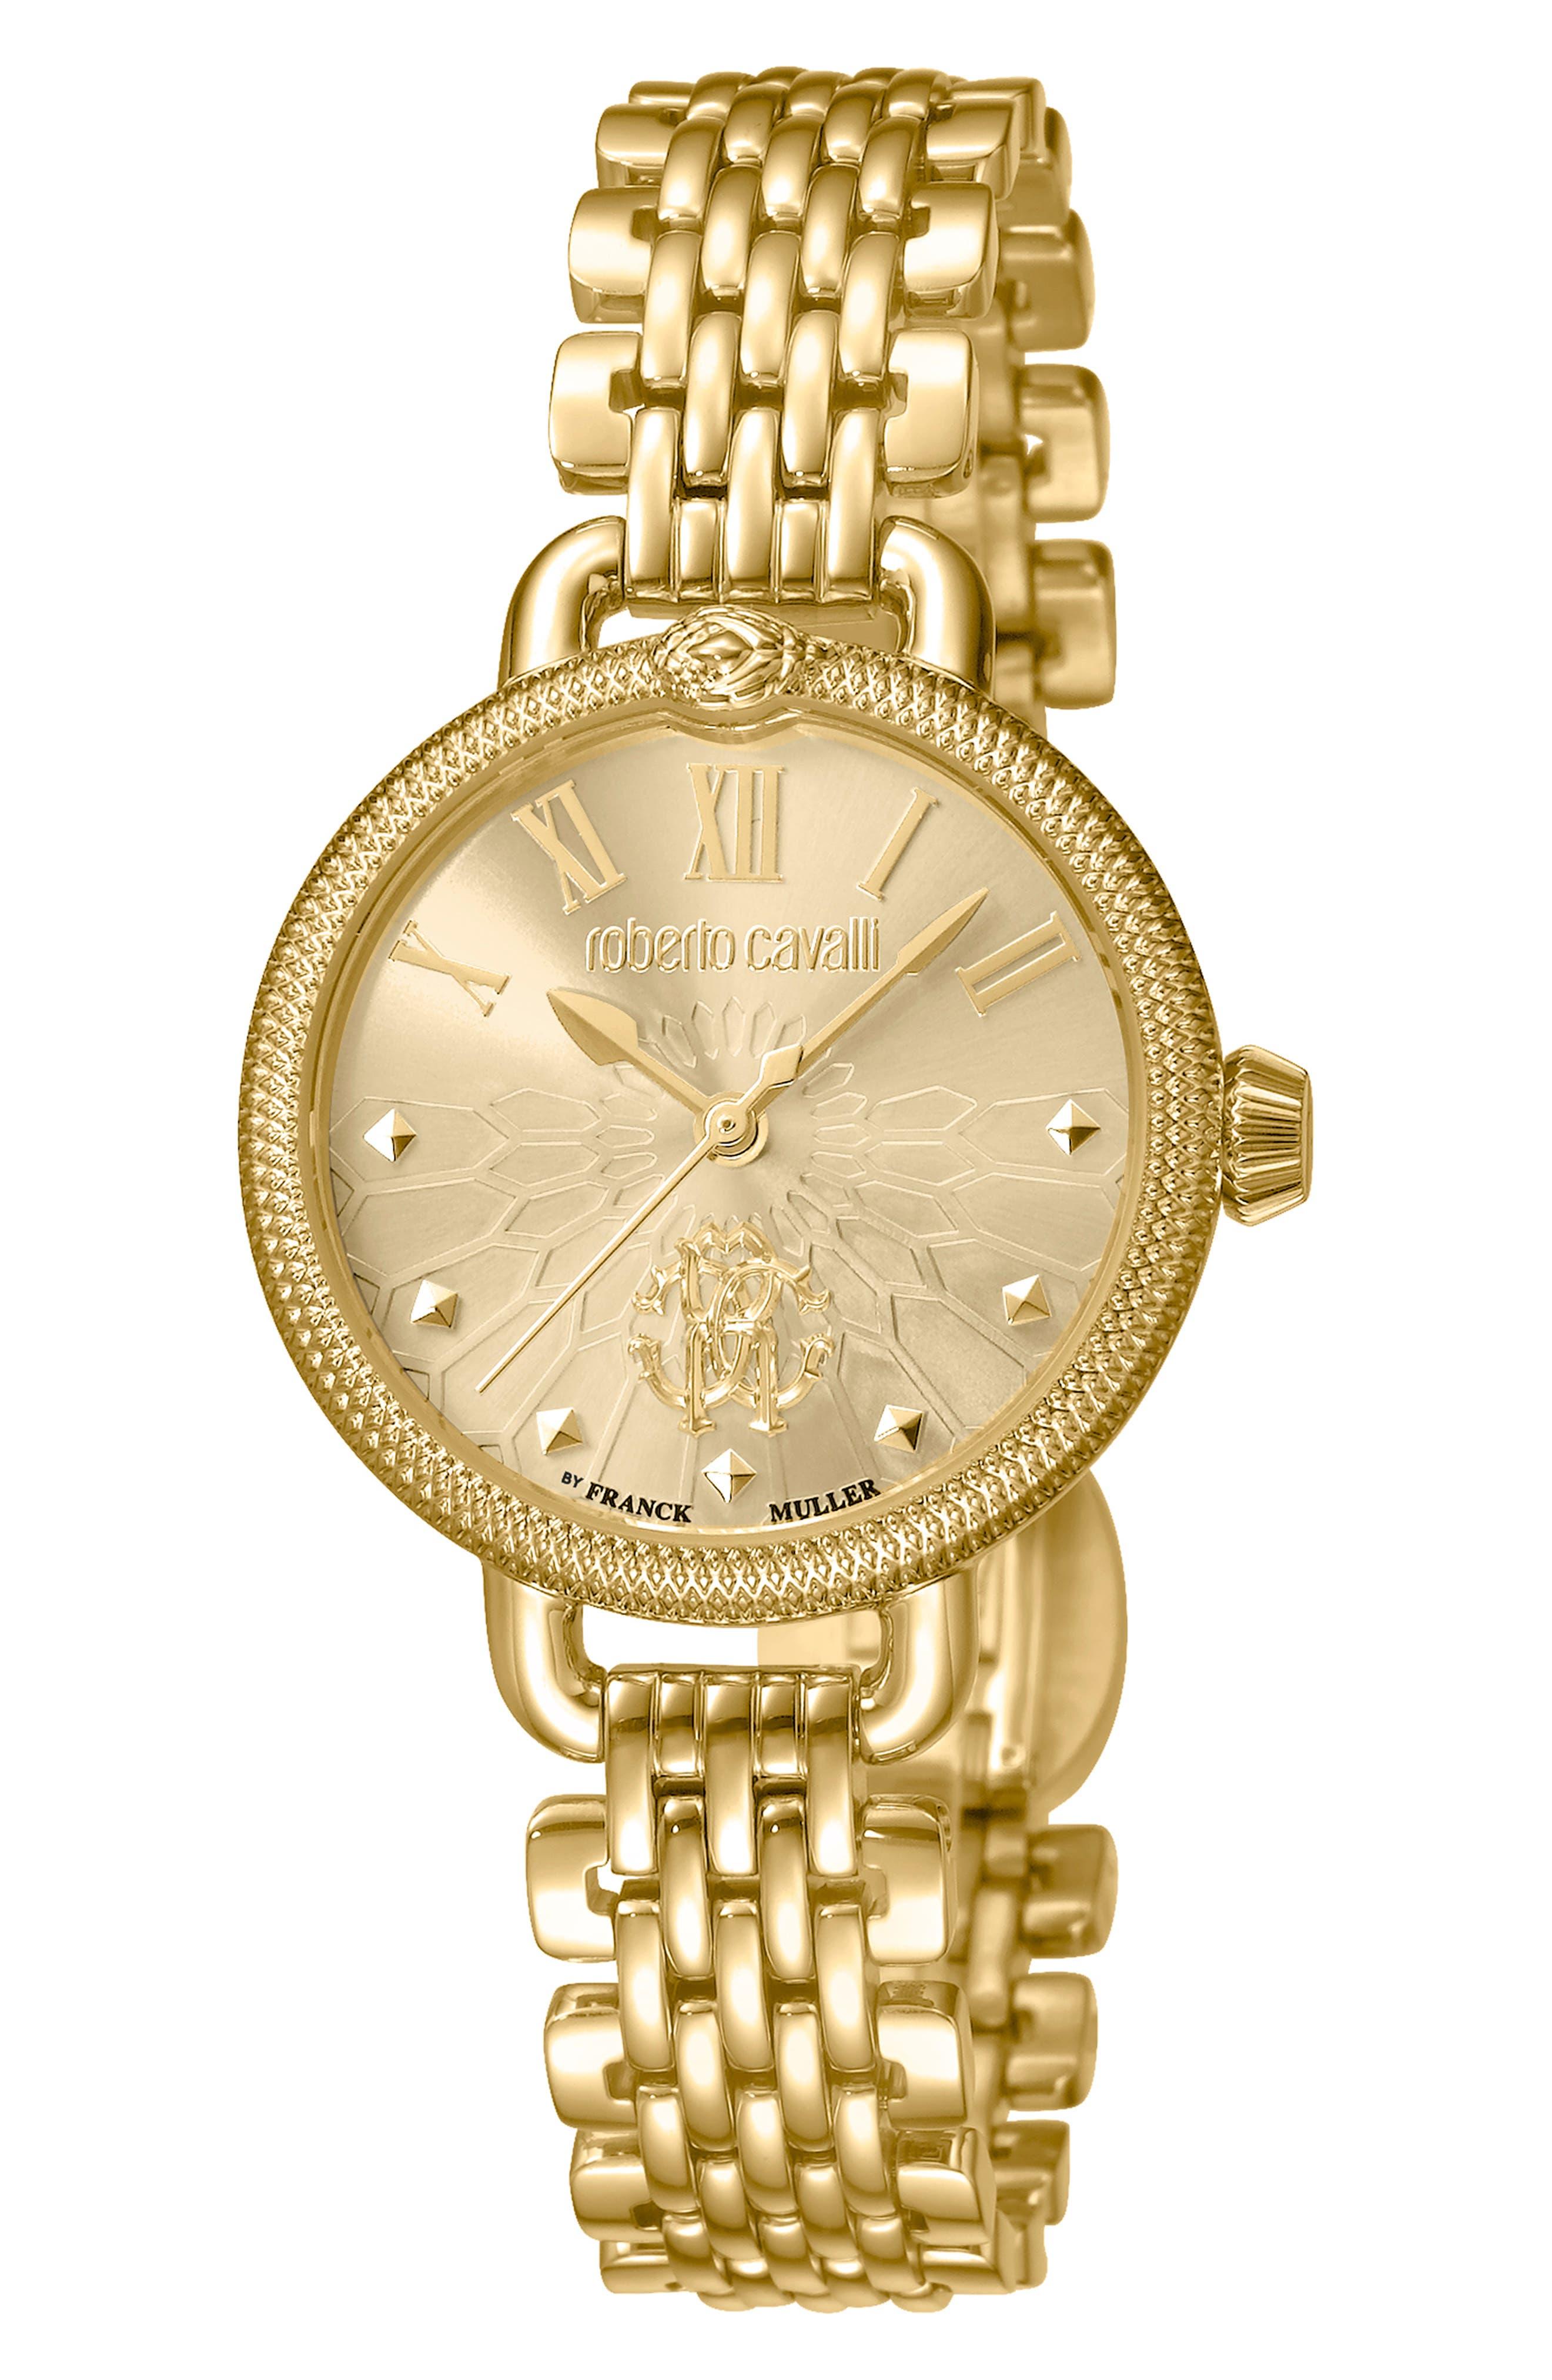 ROBERTO CAVALLI BY FRANCK MULLER Floreale Bracelet Watch, 30Mm in Gold